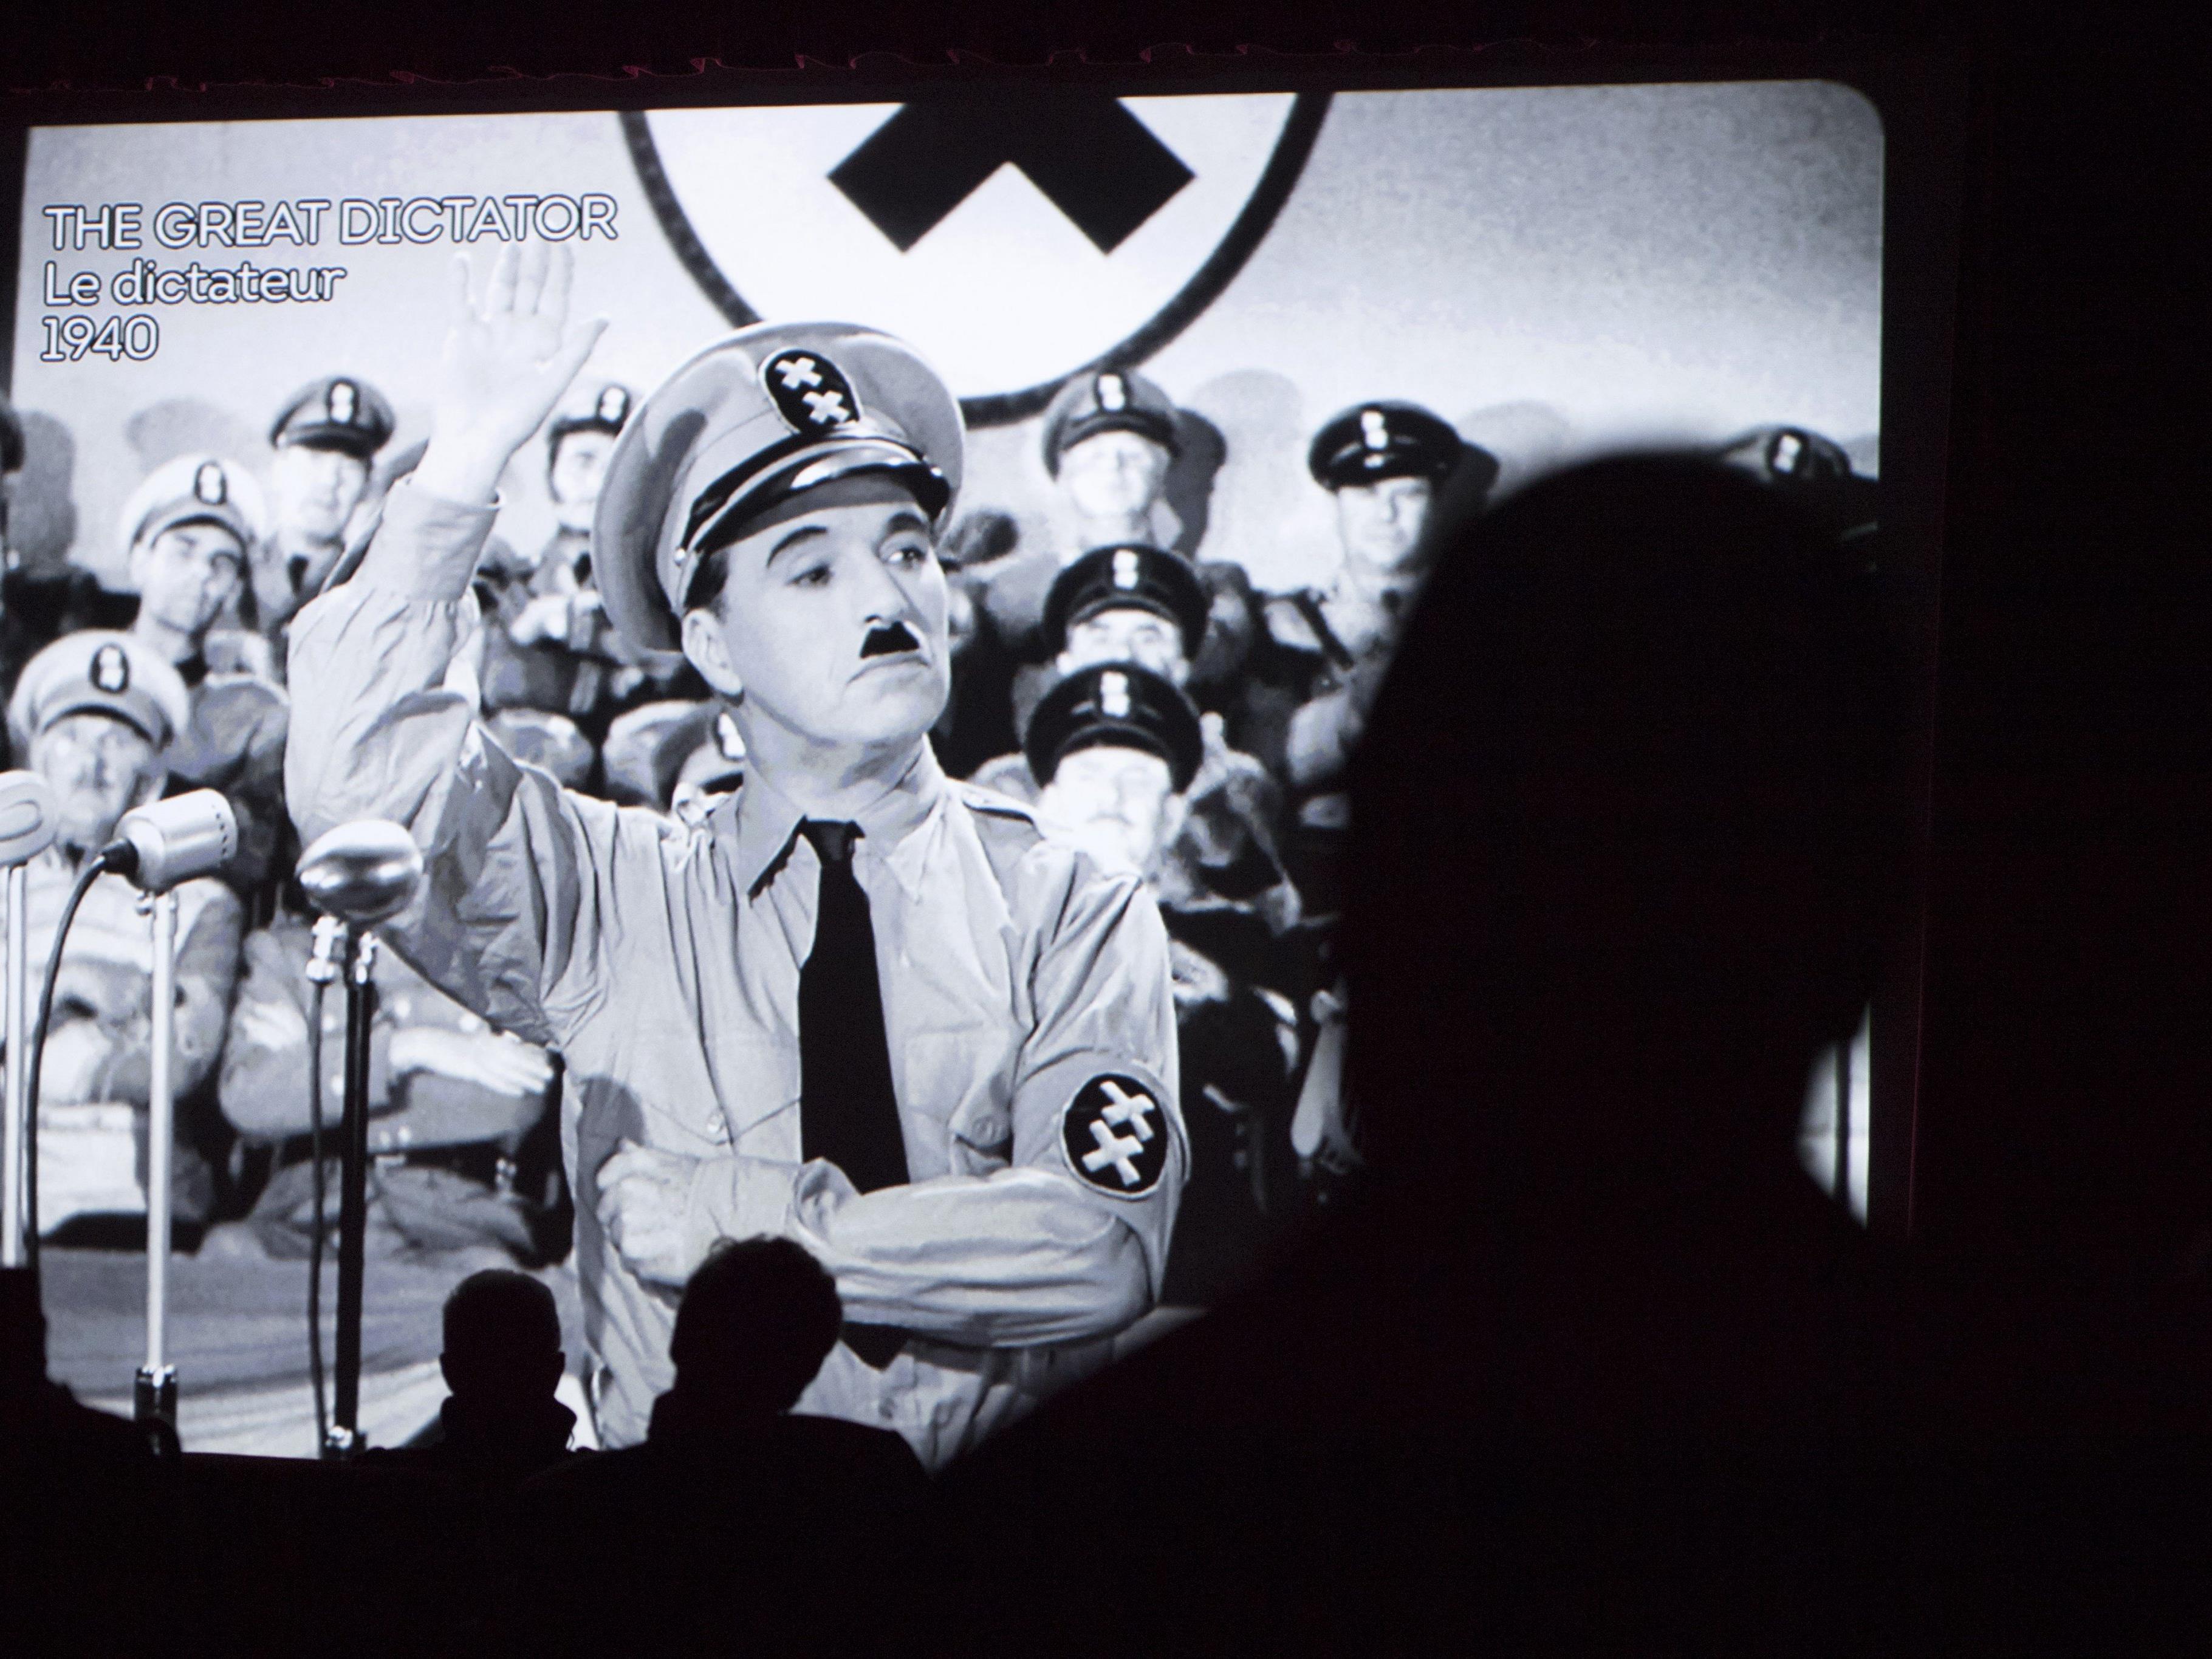 US-Regierung habe Komiker lange an Hitler-Satire gehindert.